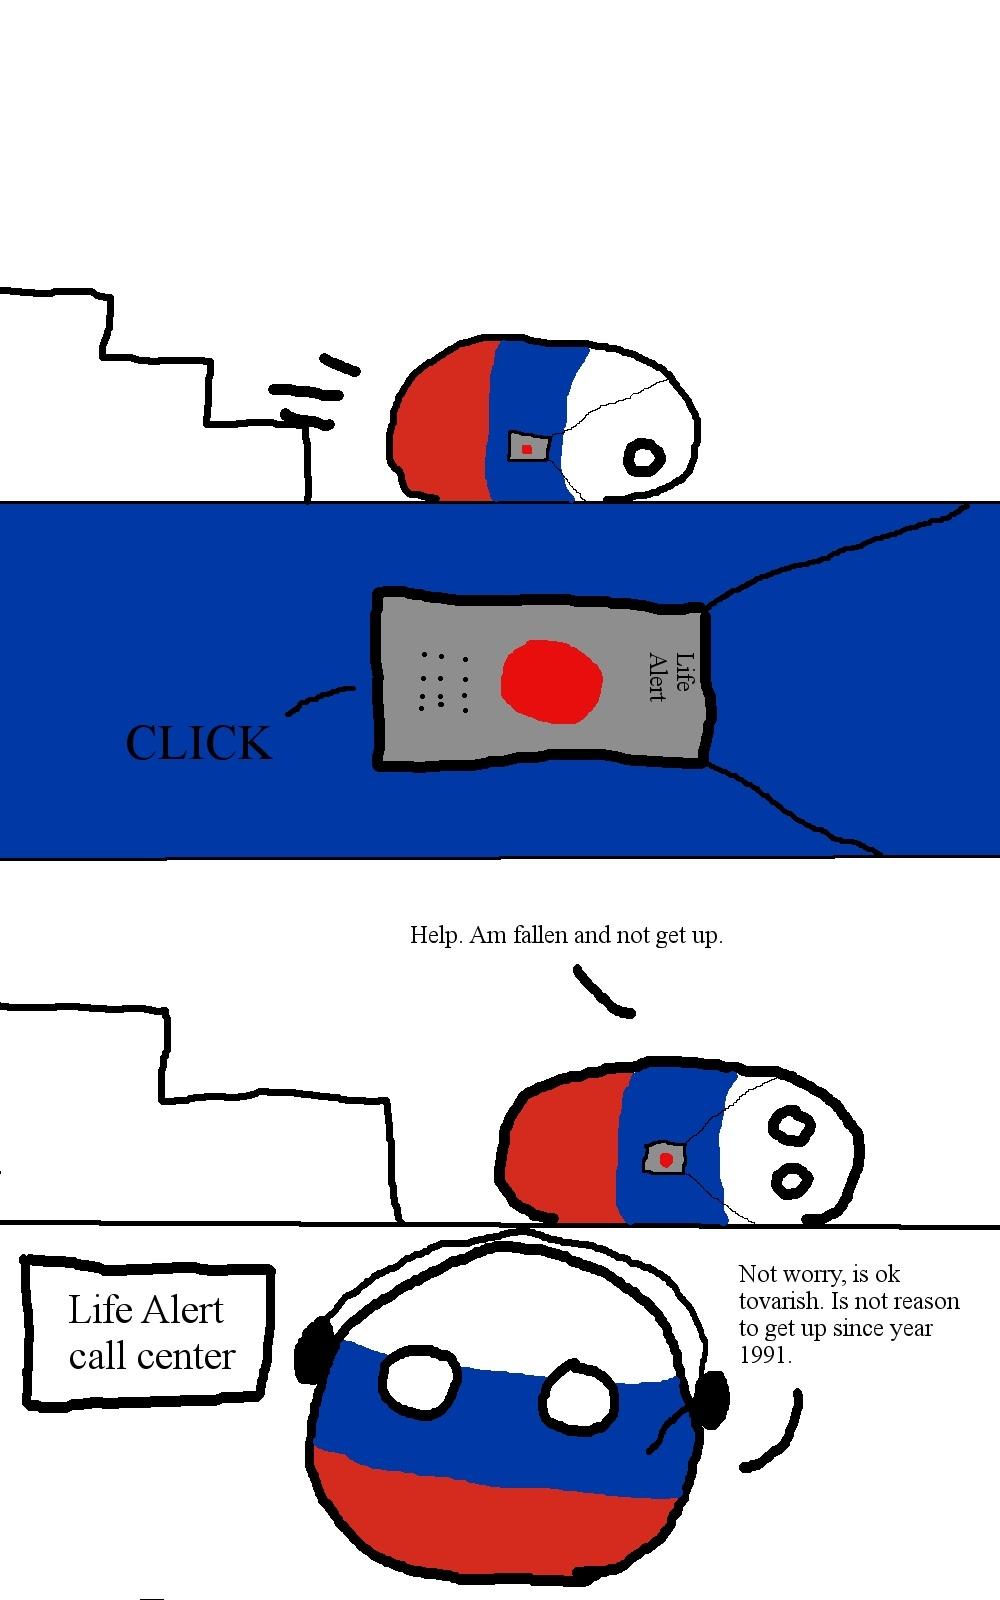 Russian Life Alert - meme